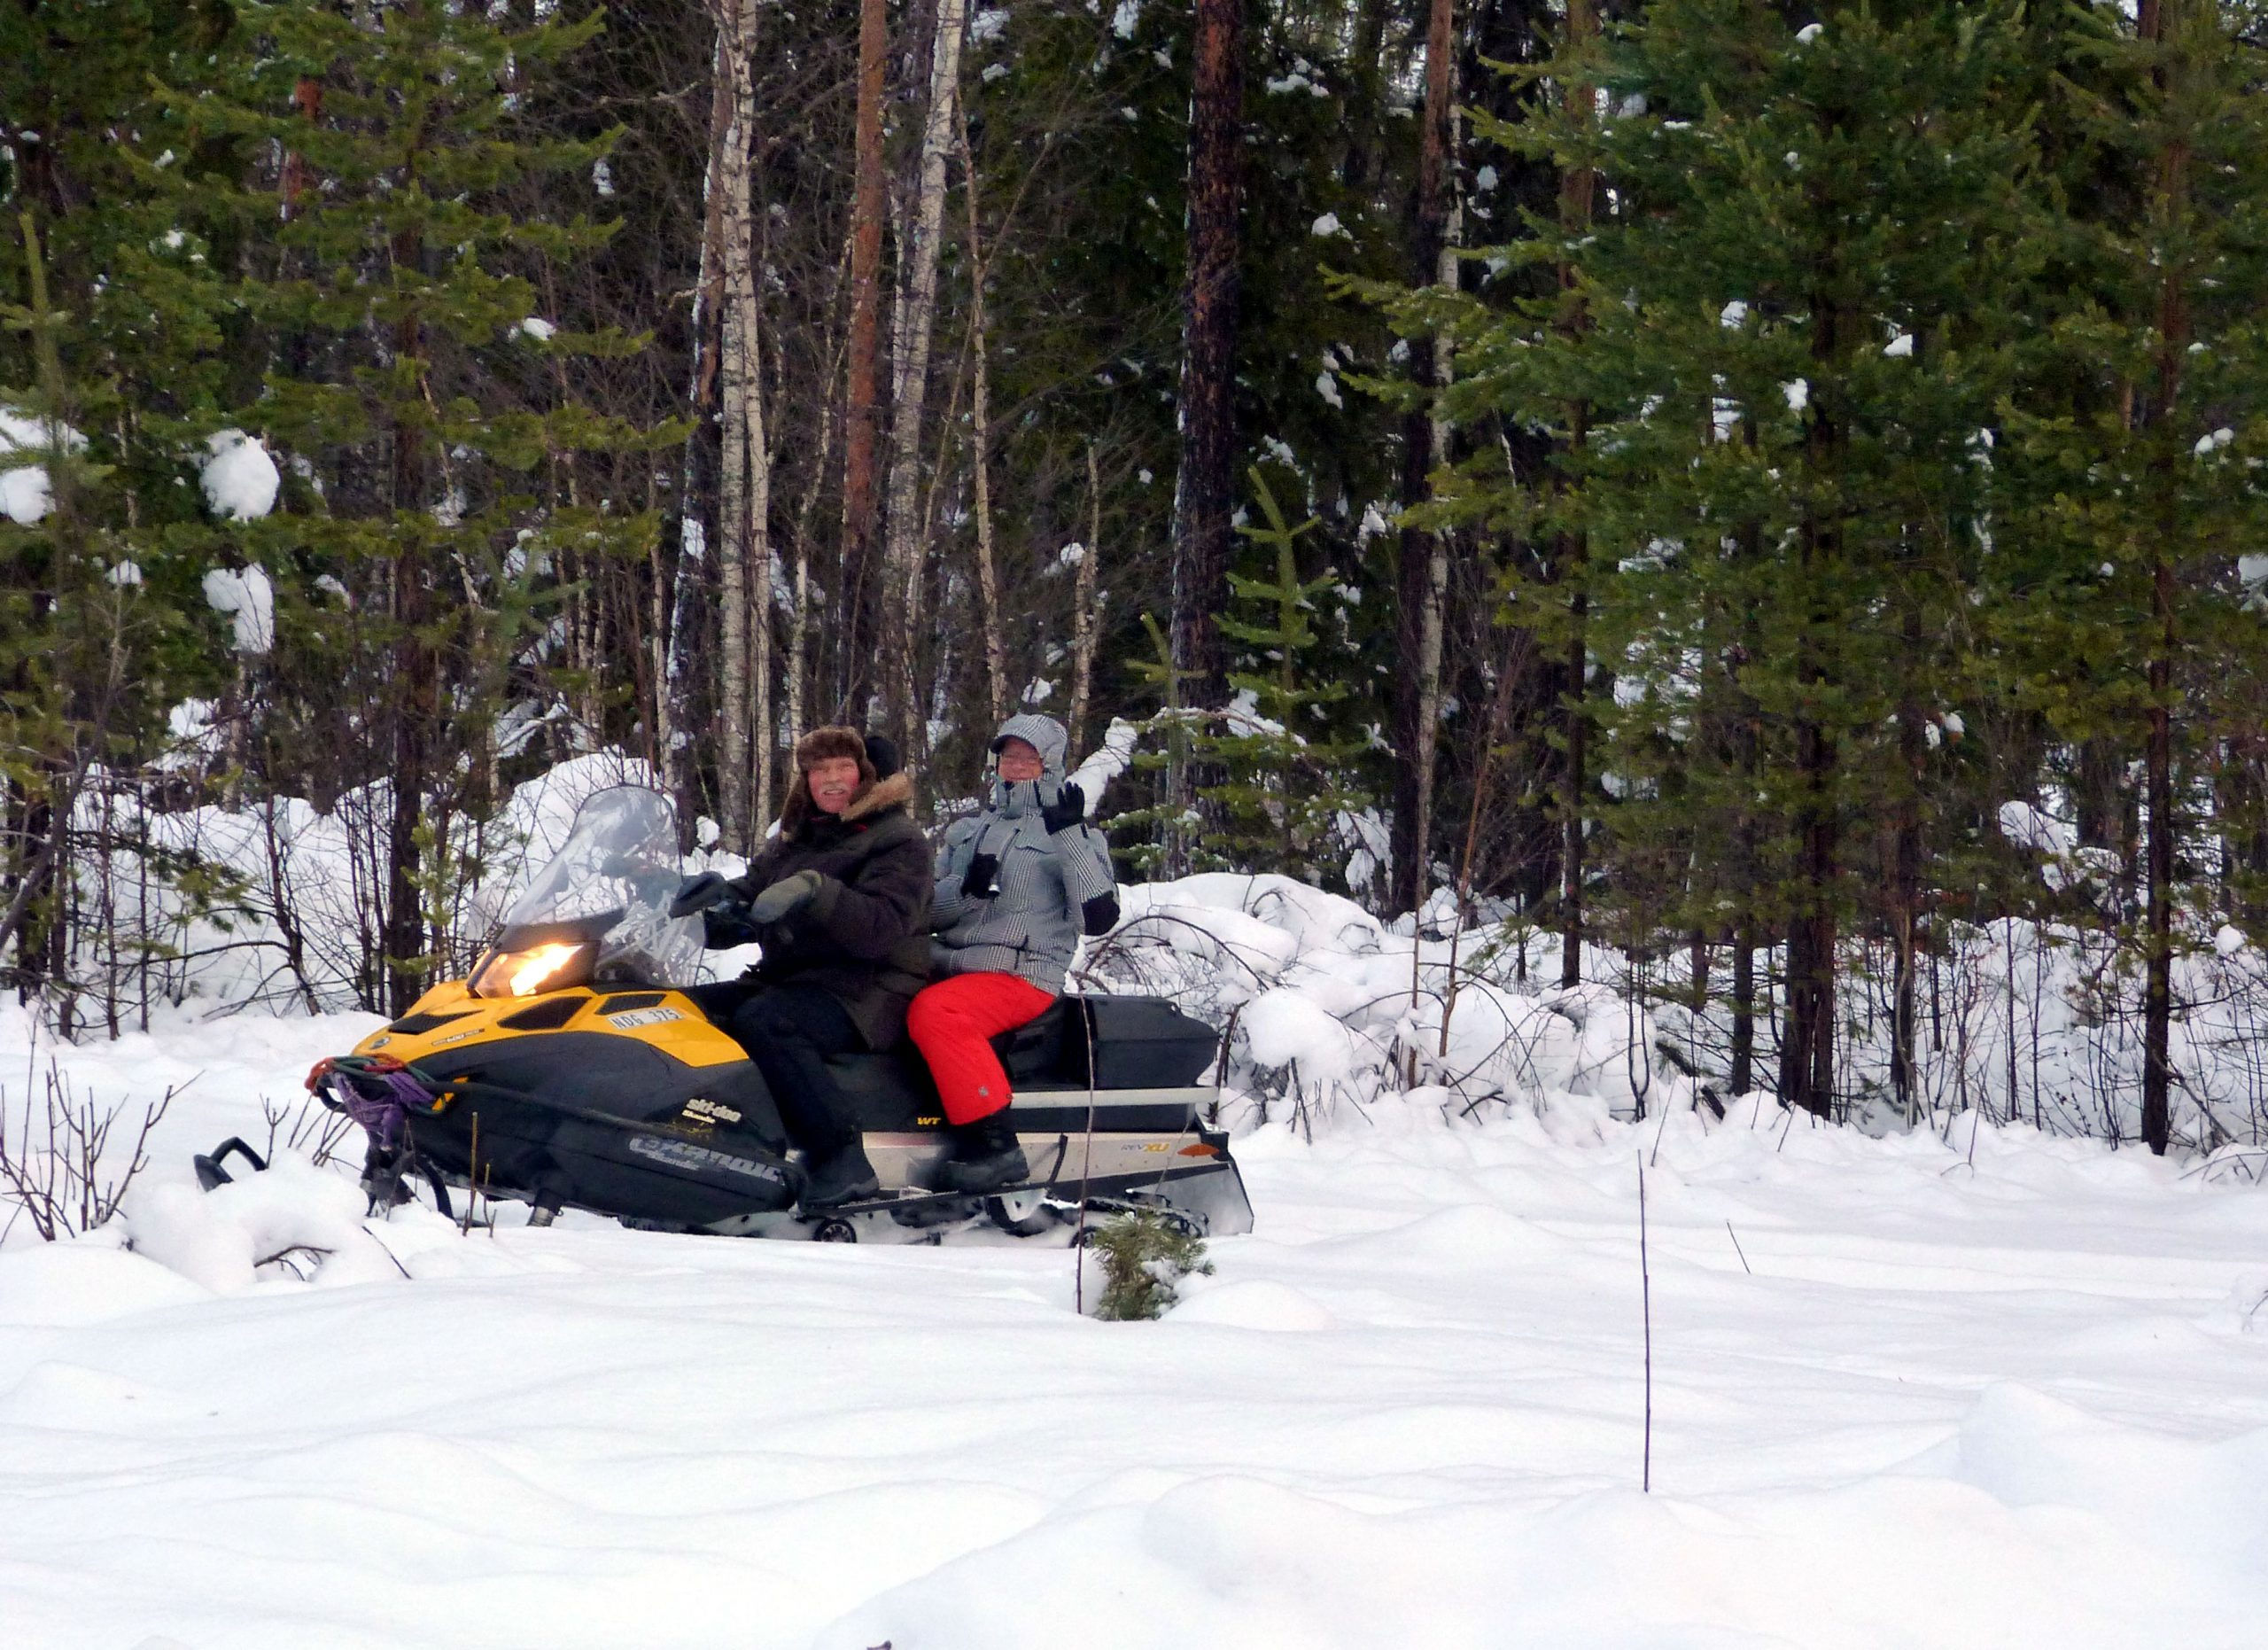 JokkmokkArcticDream-Snowmobile-Jaap